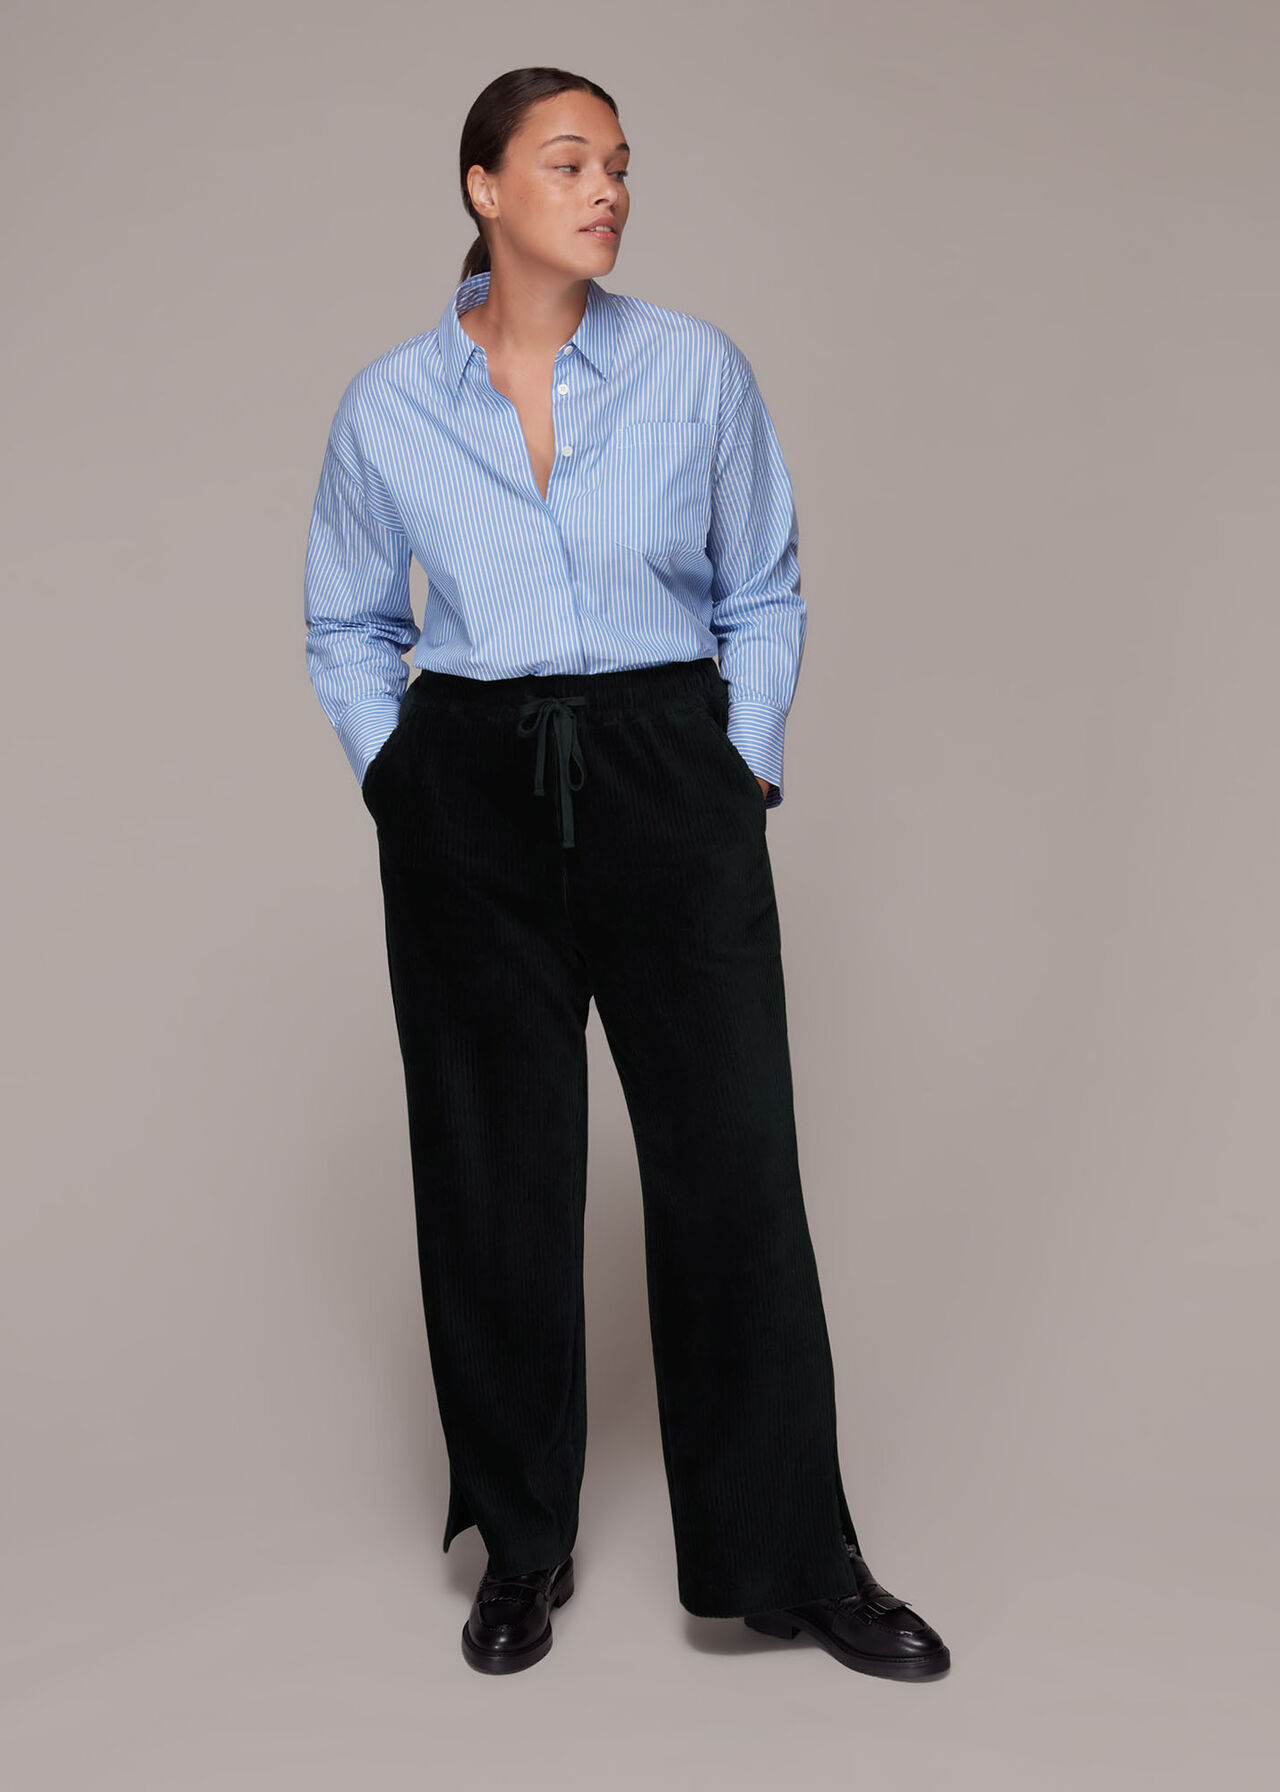 Millie Corduroy Trouser